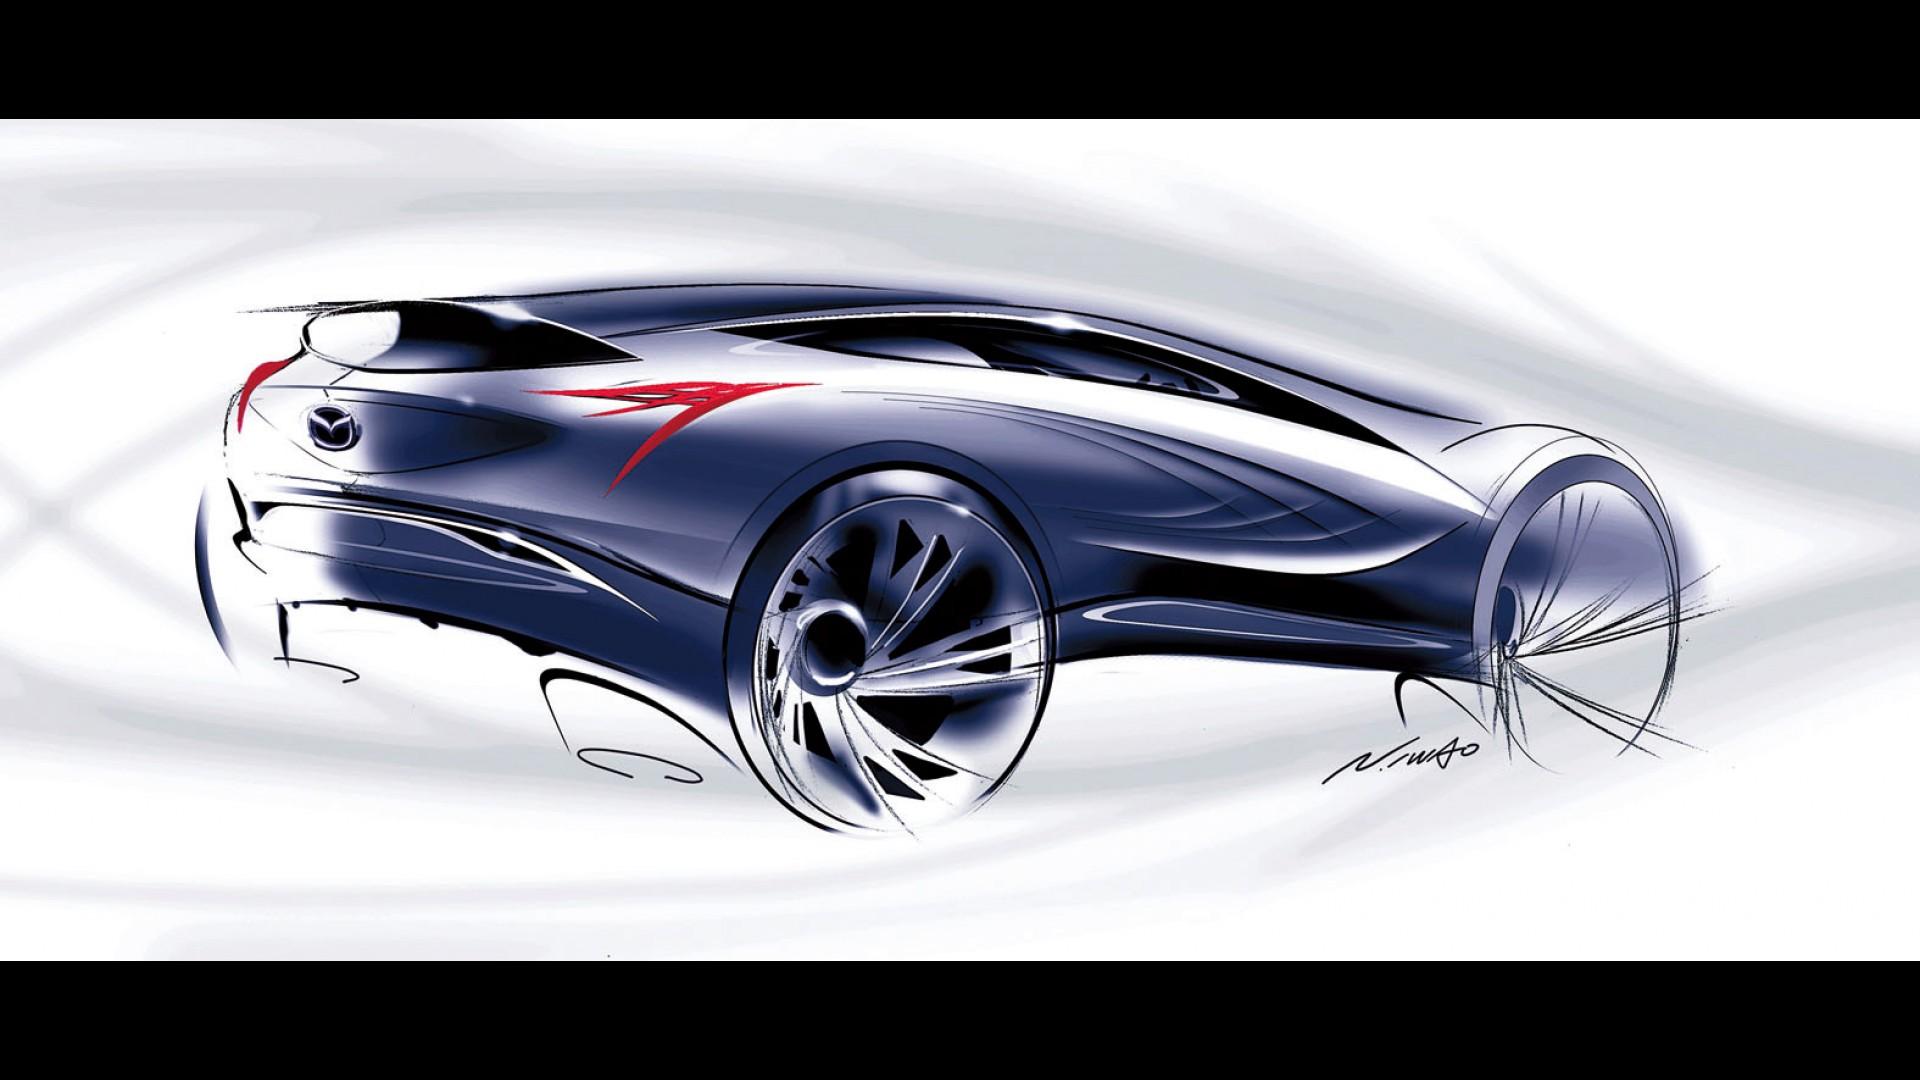 https://icdn-4.motor1.com/images/mgl/LPyo3/s1/mazda-kazamai-concept.jpg